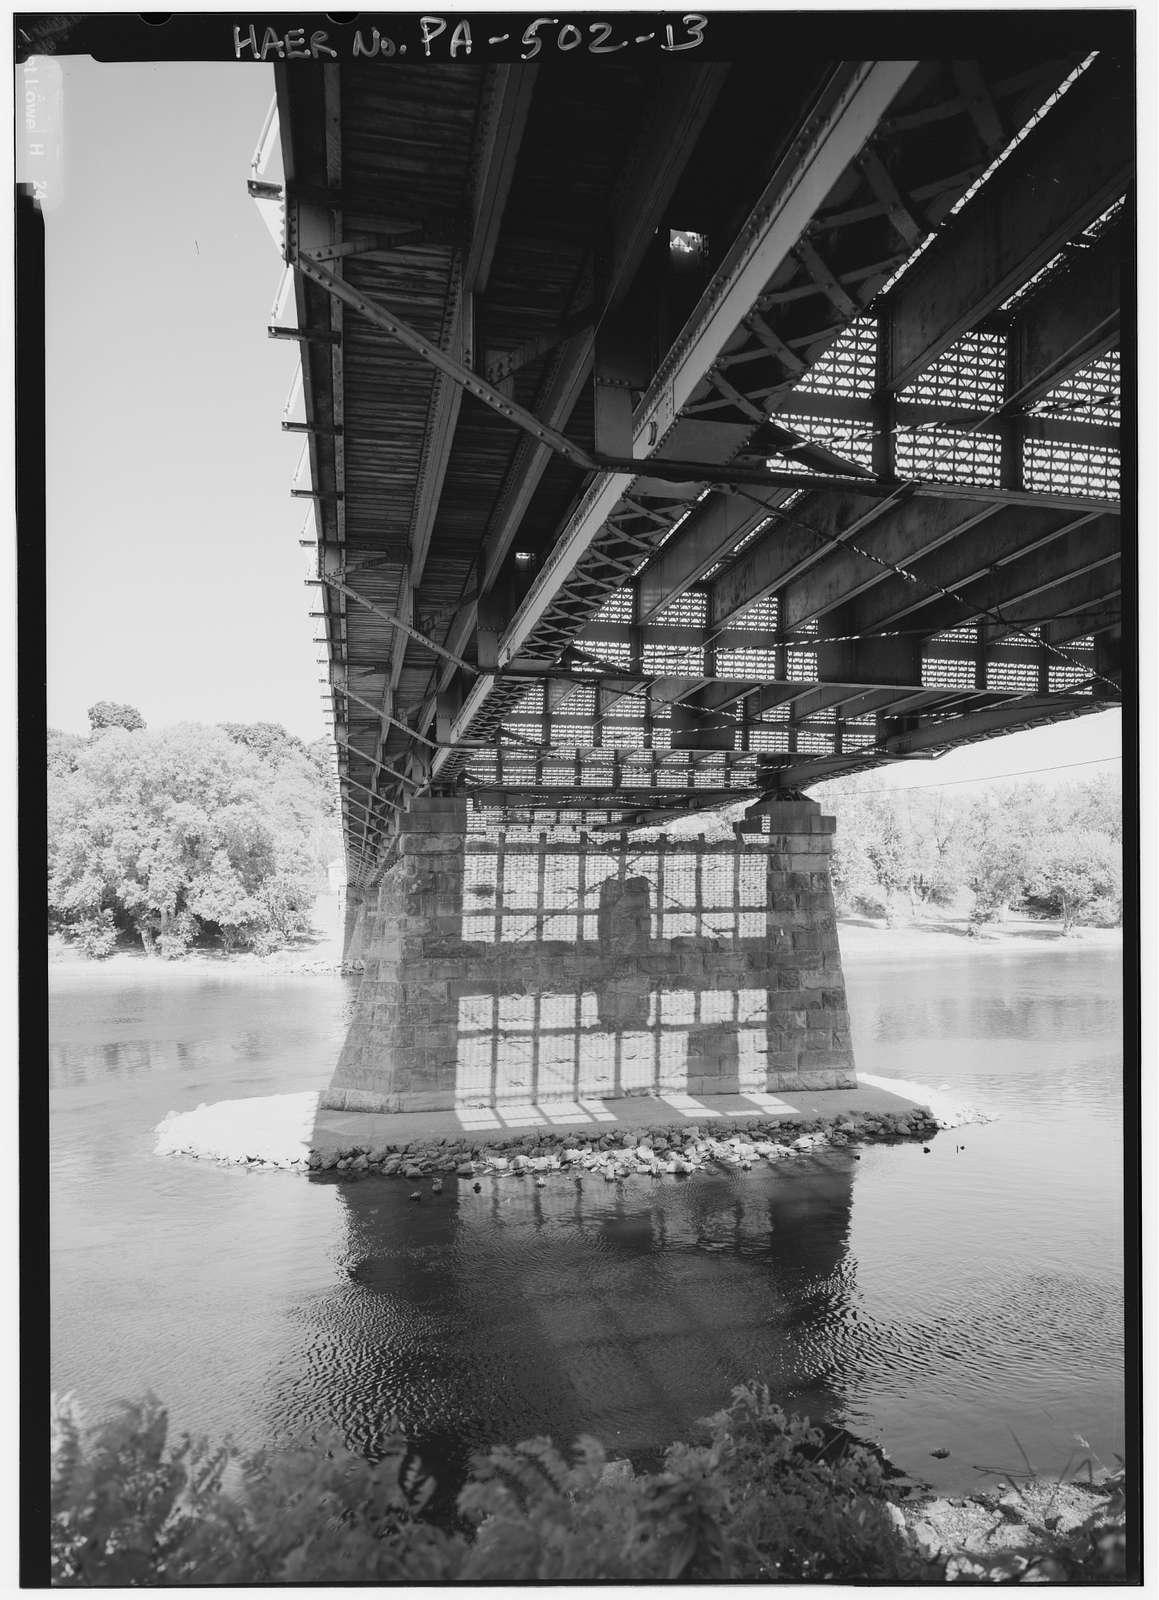 Northampton Street Bridge, Spanning Delaware River at Northampton Street (U.S. Route 22 Alternate), Easton, Northampton County, PA